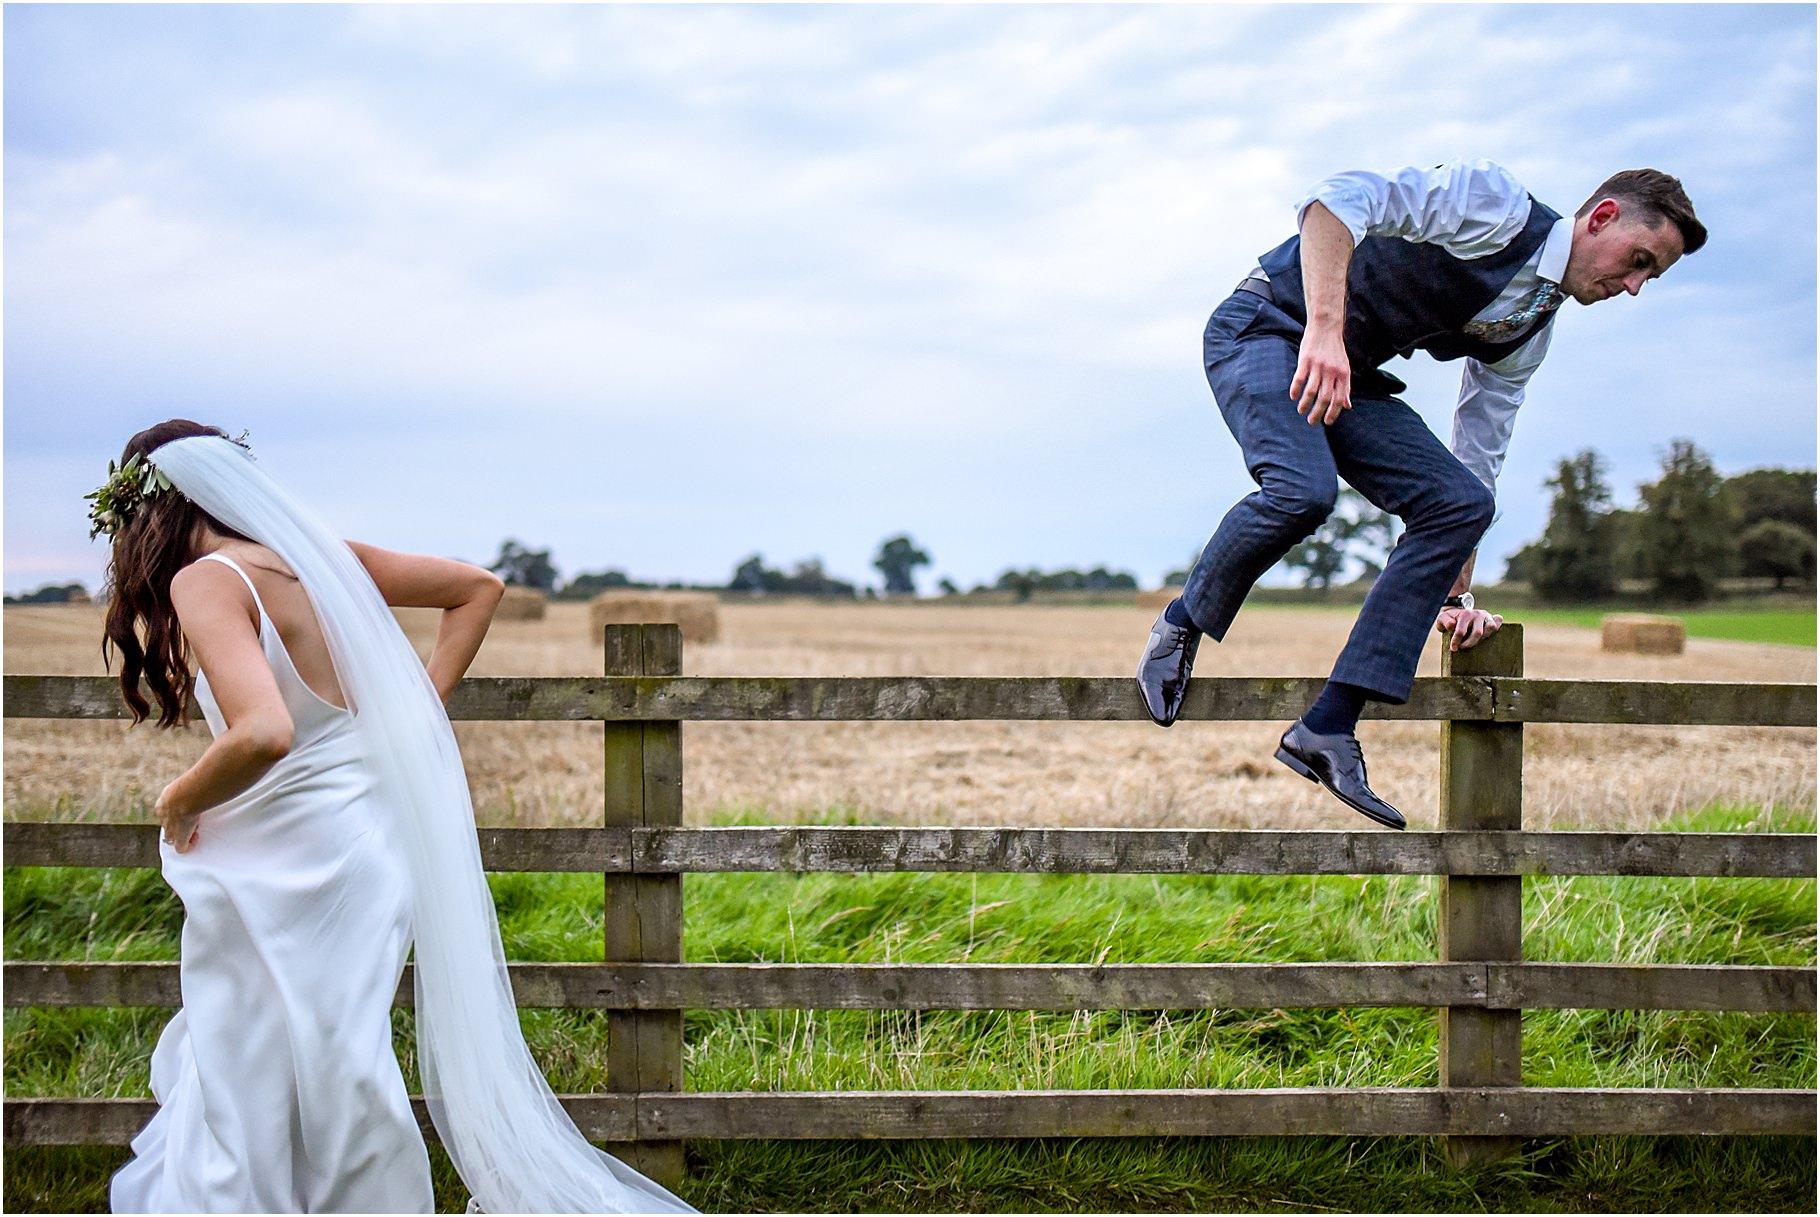 dan-wootton-photography-2017-weddings-051.jpg